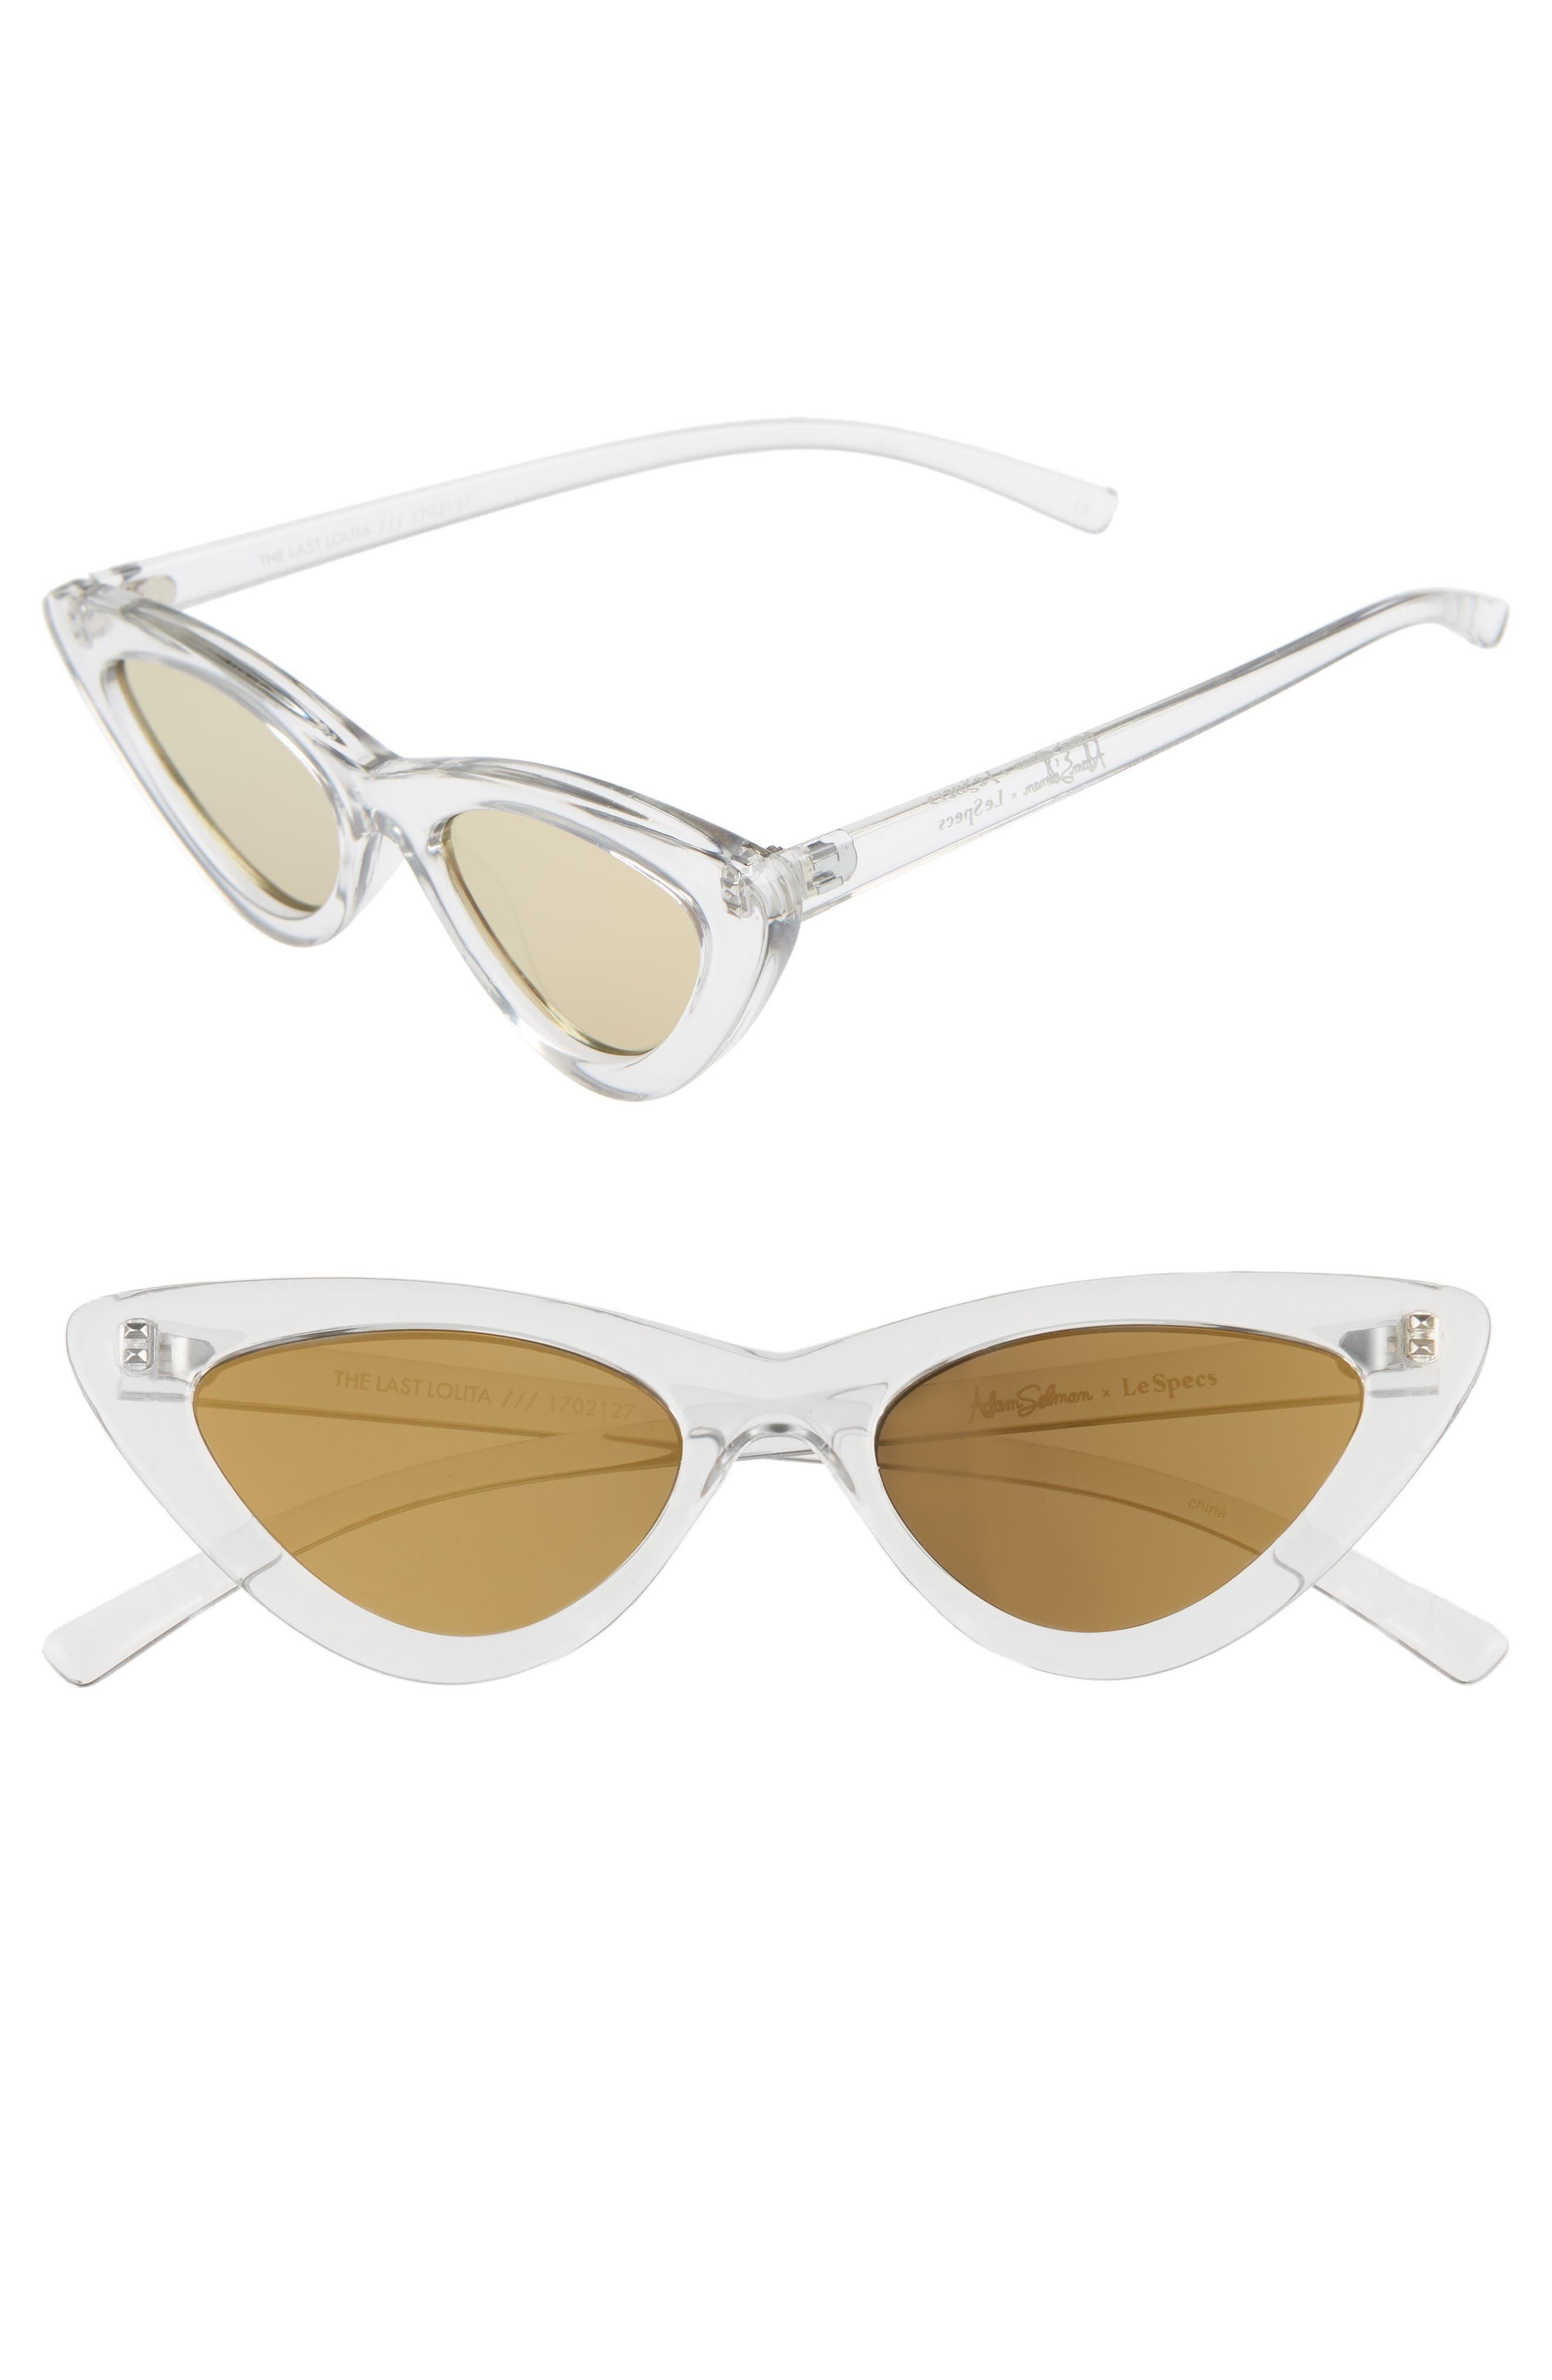 Lolita 49mm Cat Eye Sunglasses,                         Main,                         color, CRYSTAL GREY